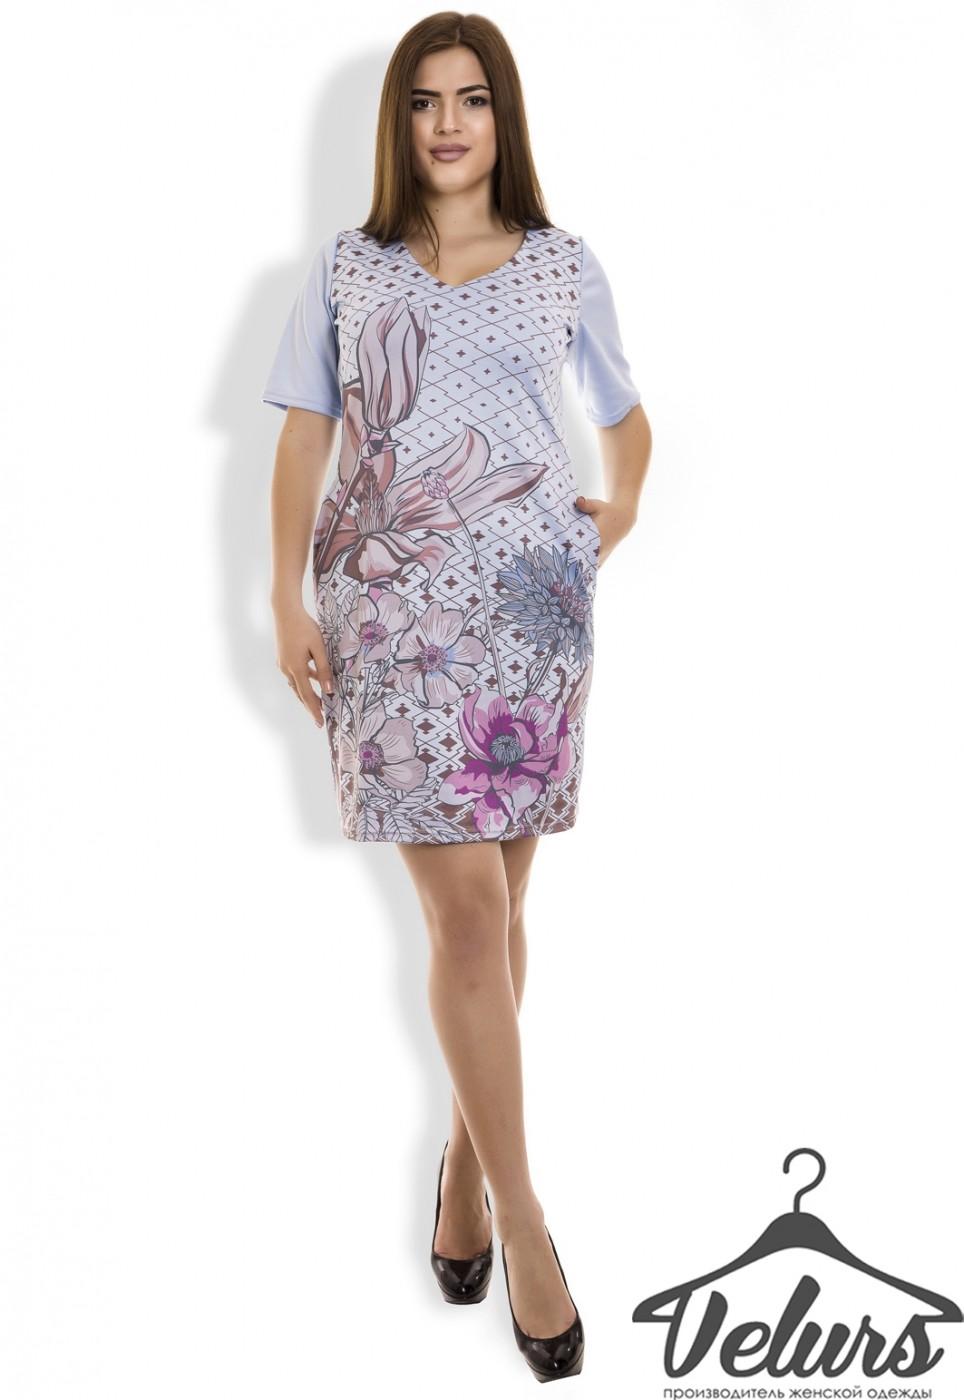 Velurs: Платье 212110 - фото 22